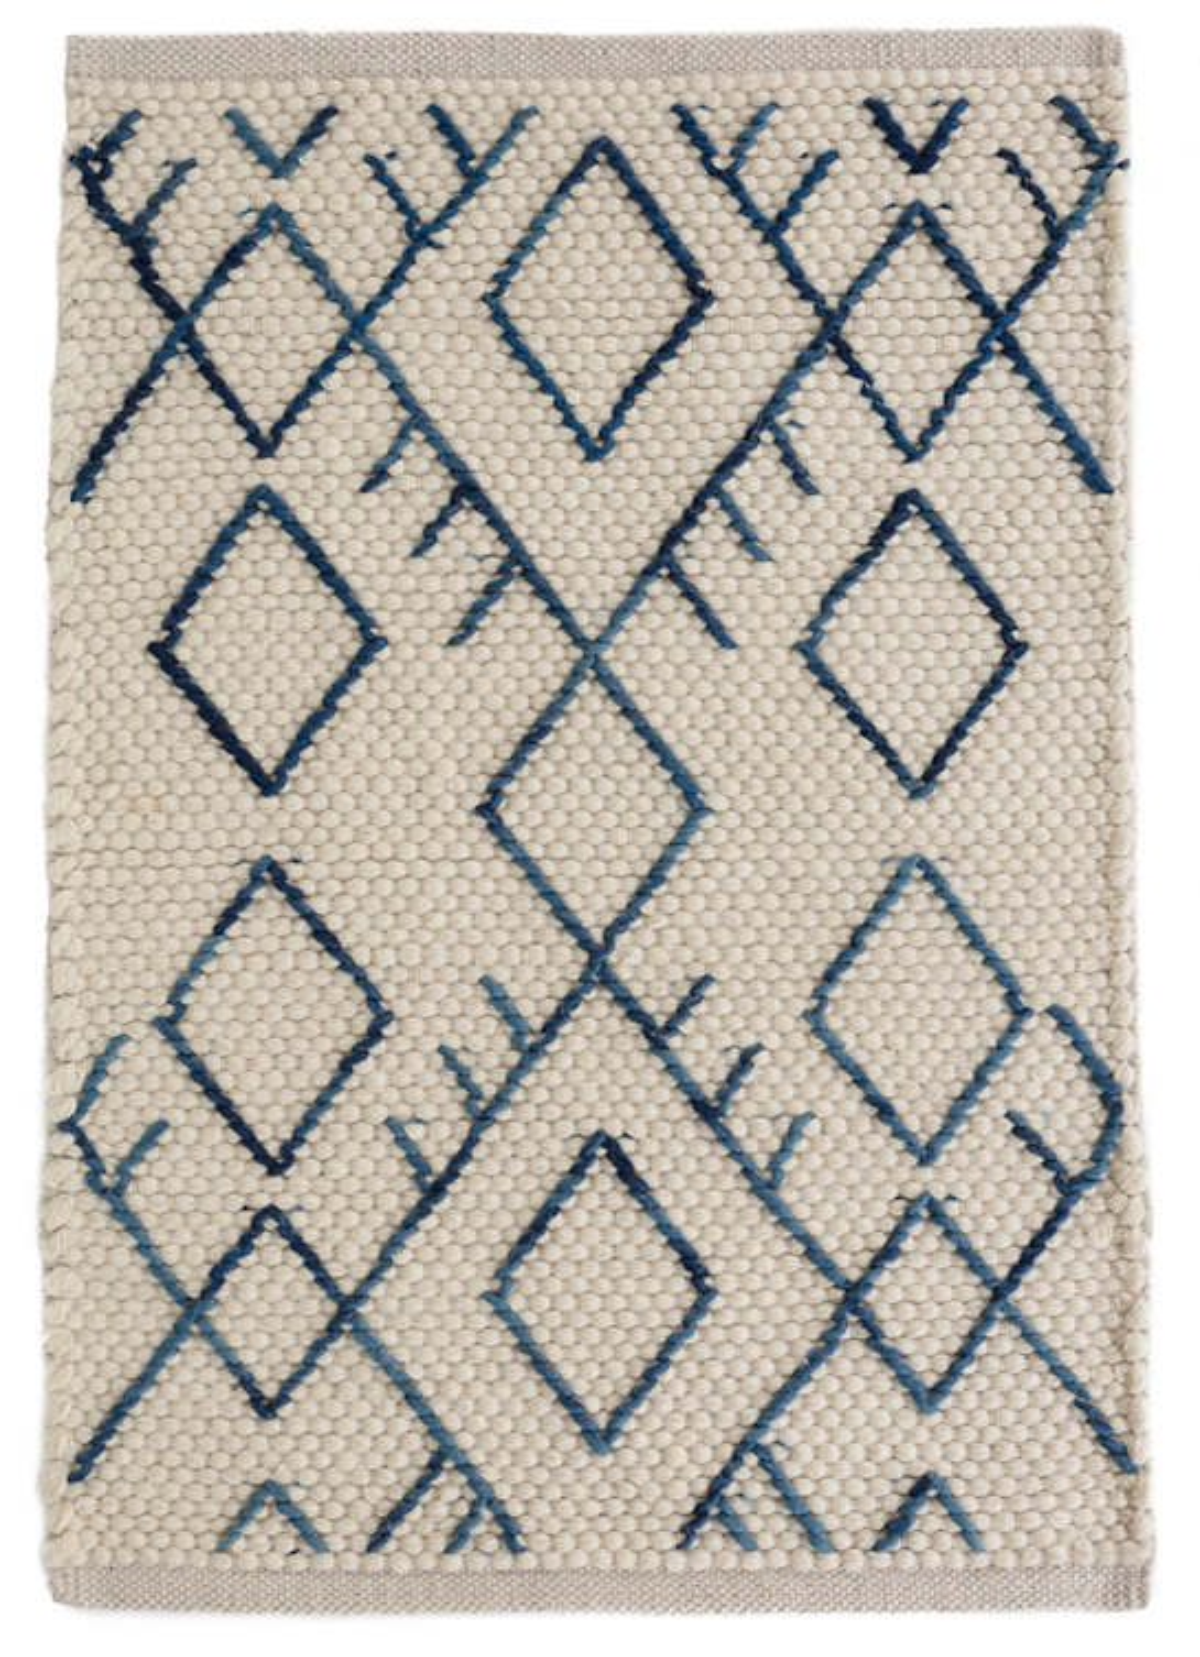 Teca Ivory Woven Wool Rug